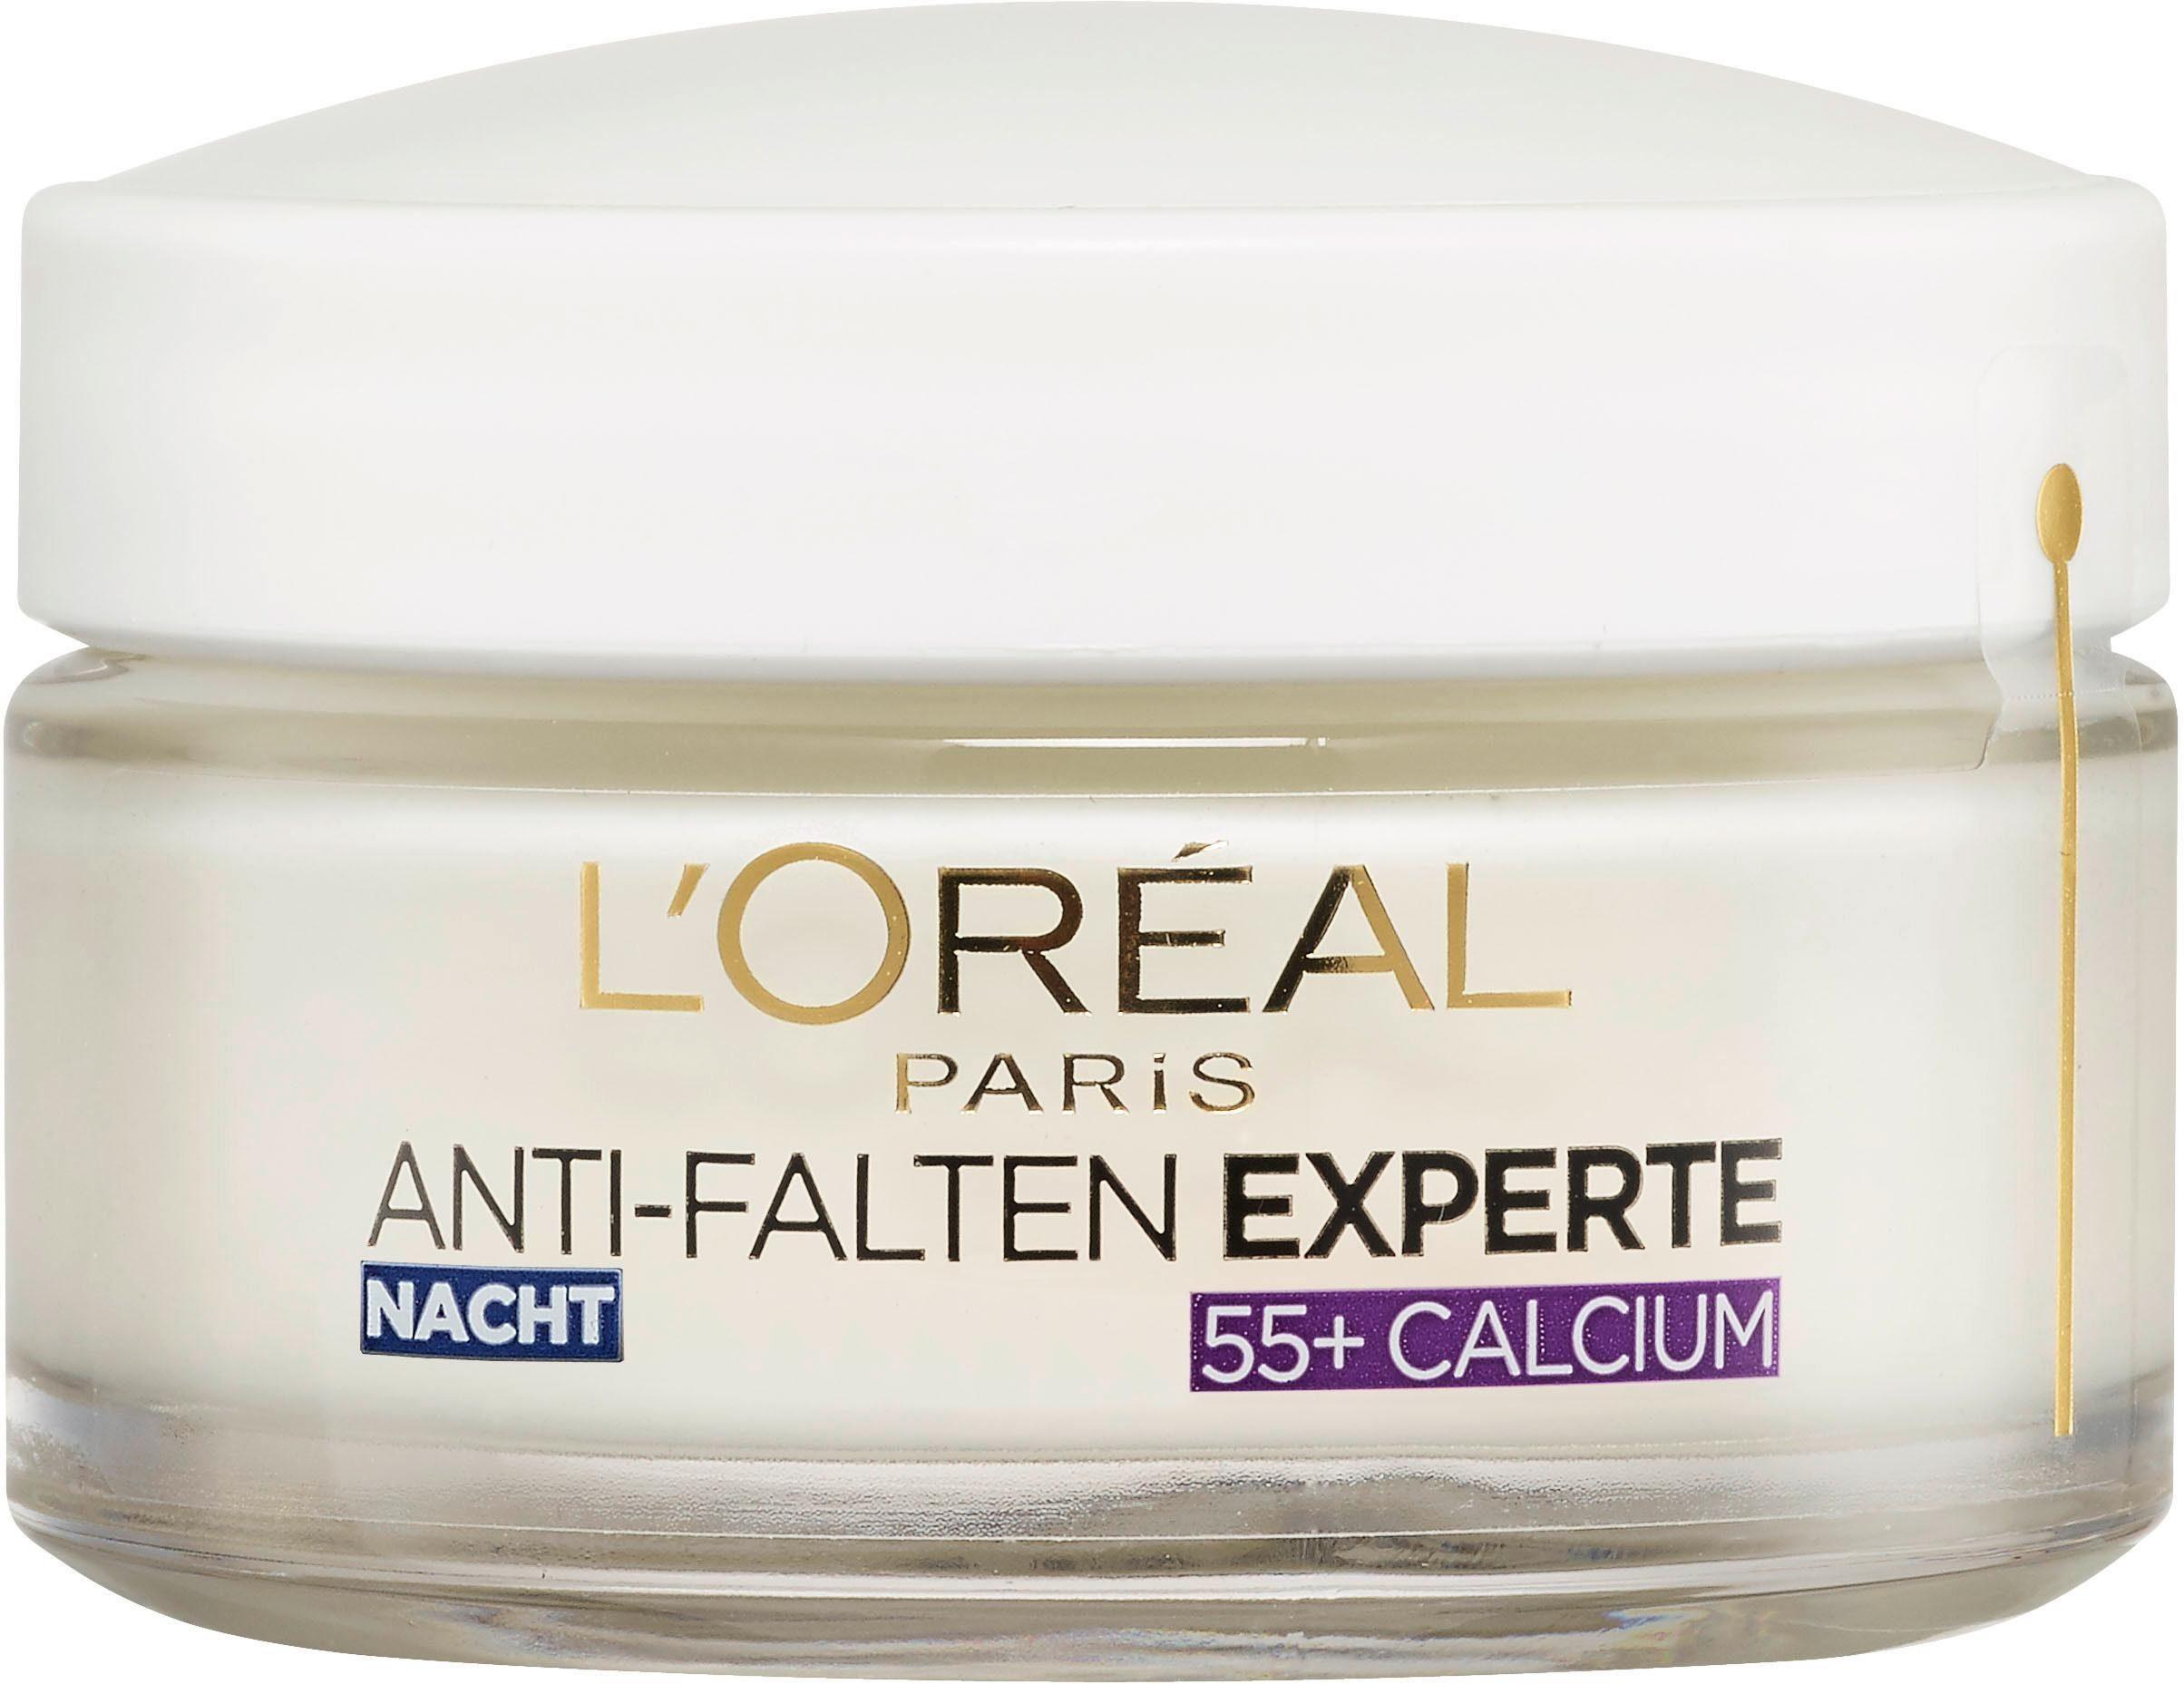 L'Oréal Paris, »Anti-Falten-Expert Calcium 55+ Nachtpflege«, Gesichtspflege